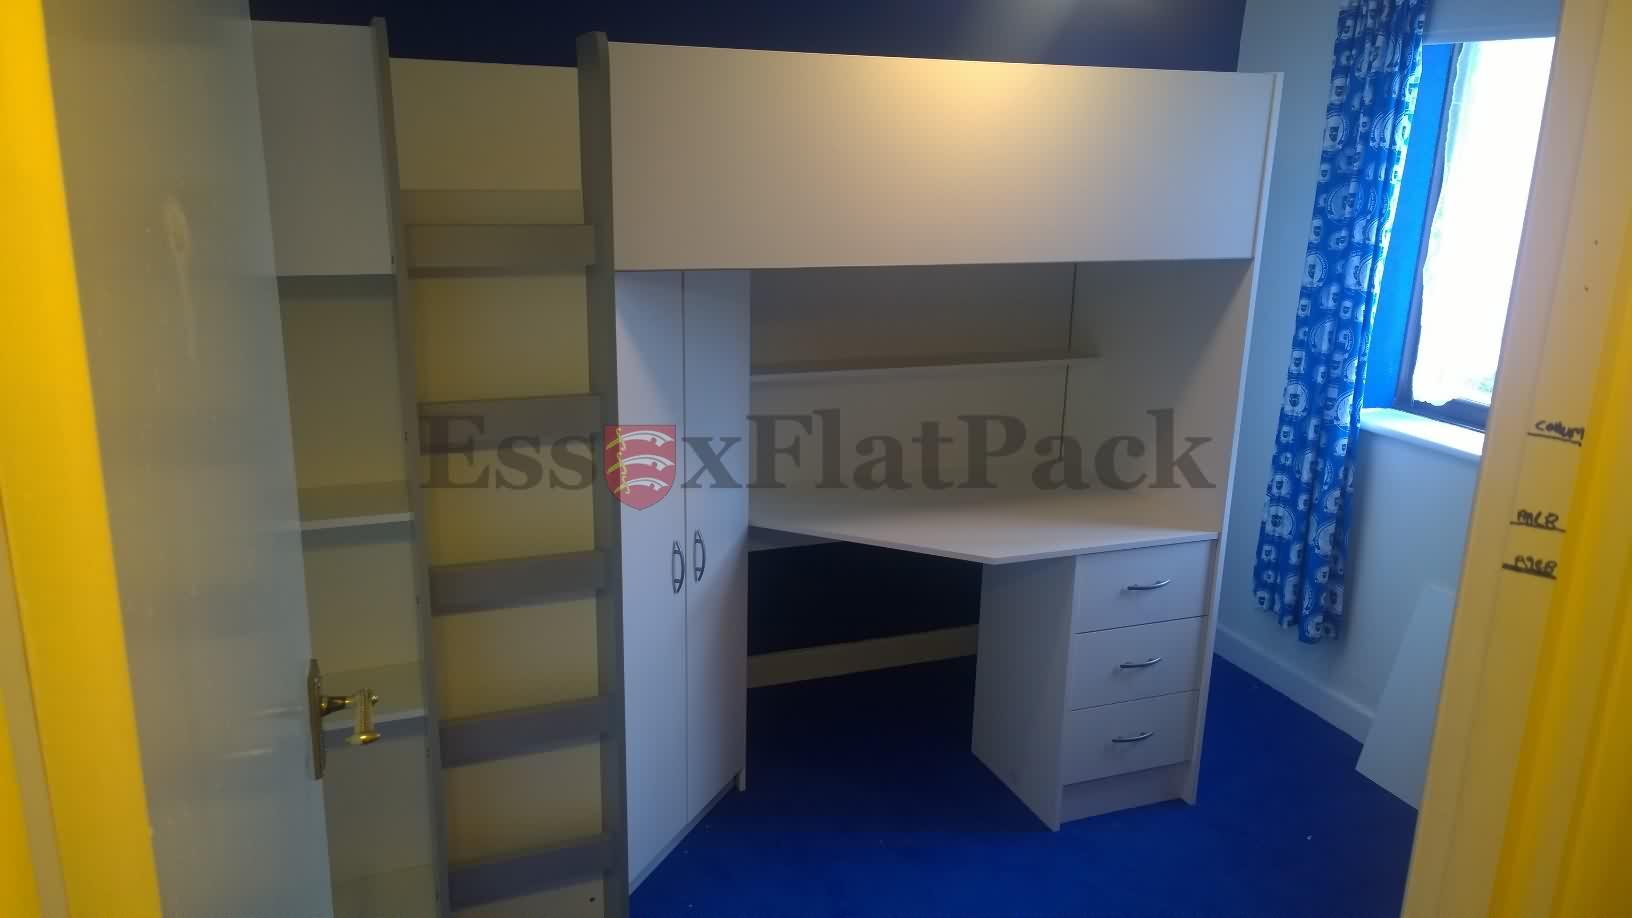 essexflatpack-cabin-bunks-20151012102900.jpg